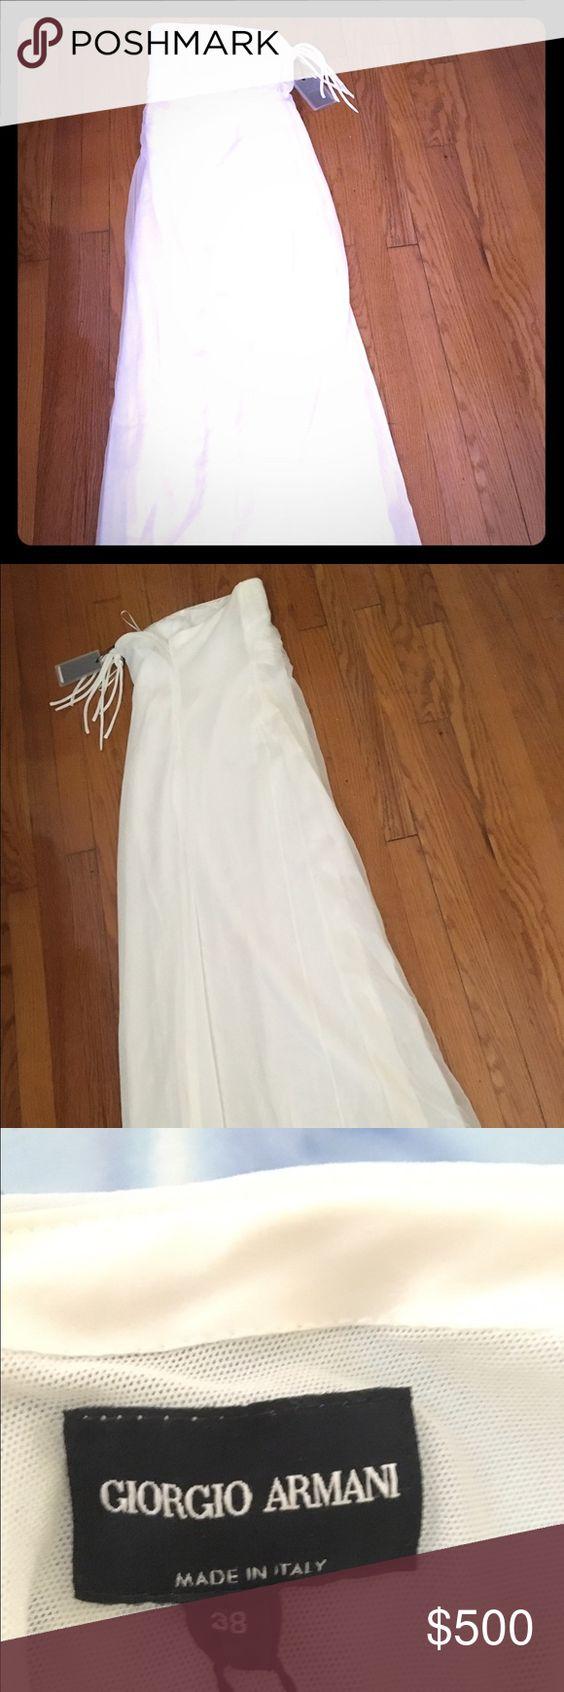 Selling this NWT Giorgio Armani dress on Poshmark! My username is: drsenfeld1. #shopmycloset #poshmark #fashion #shopping #style #forsale #Giorgio Armani #Dresses & Skirts